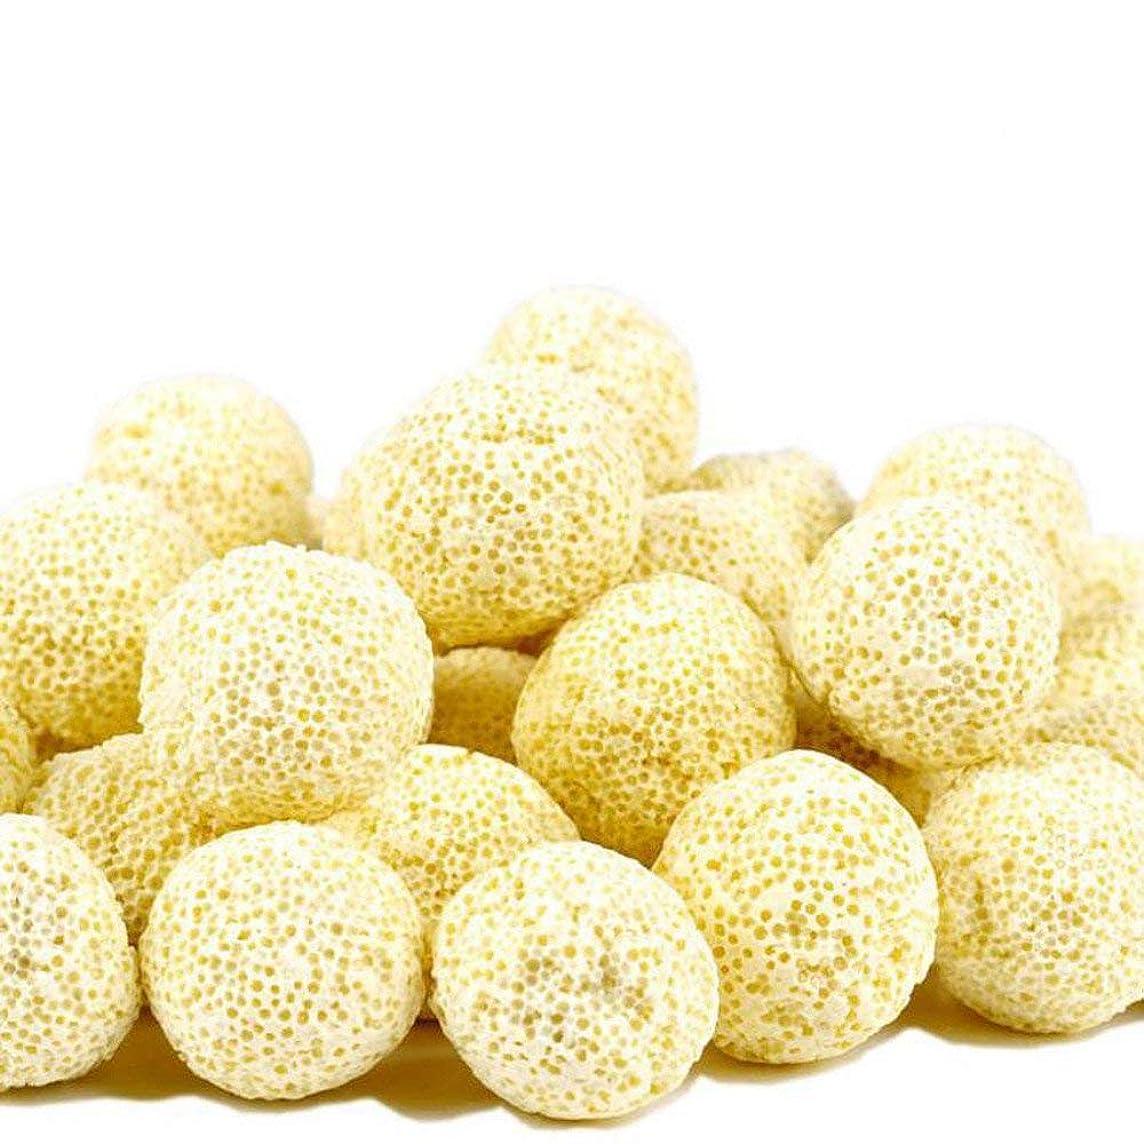 OSAYES Aquarium Porous Ceramic Filter Media Net Bag Biological Ball Fish Tank (10PC)